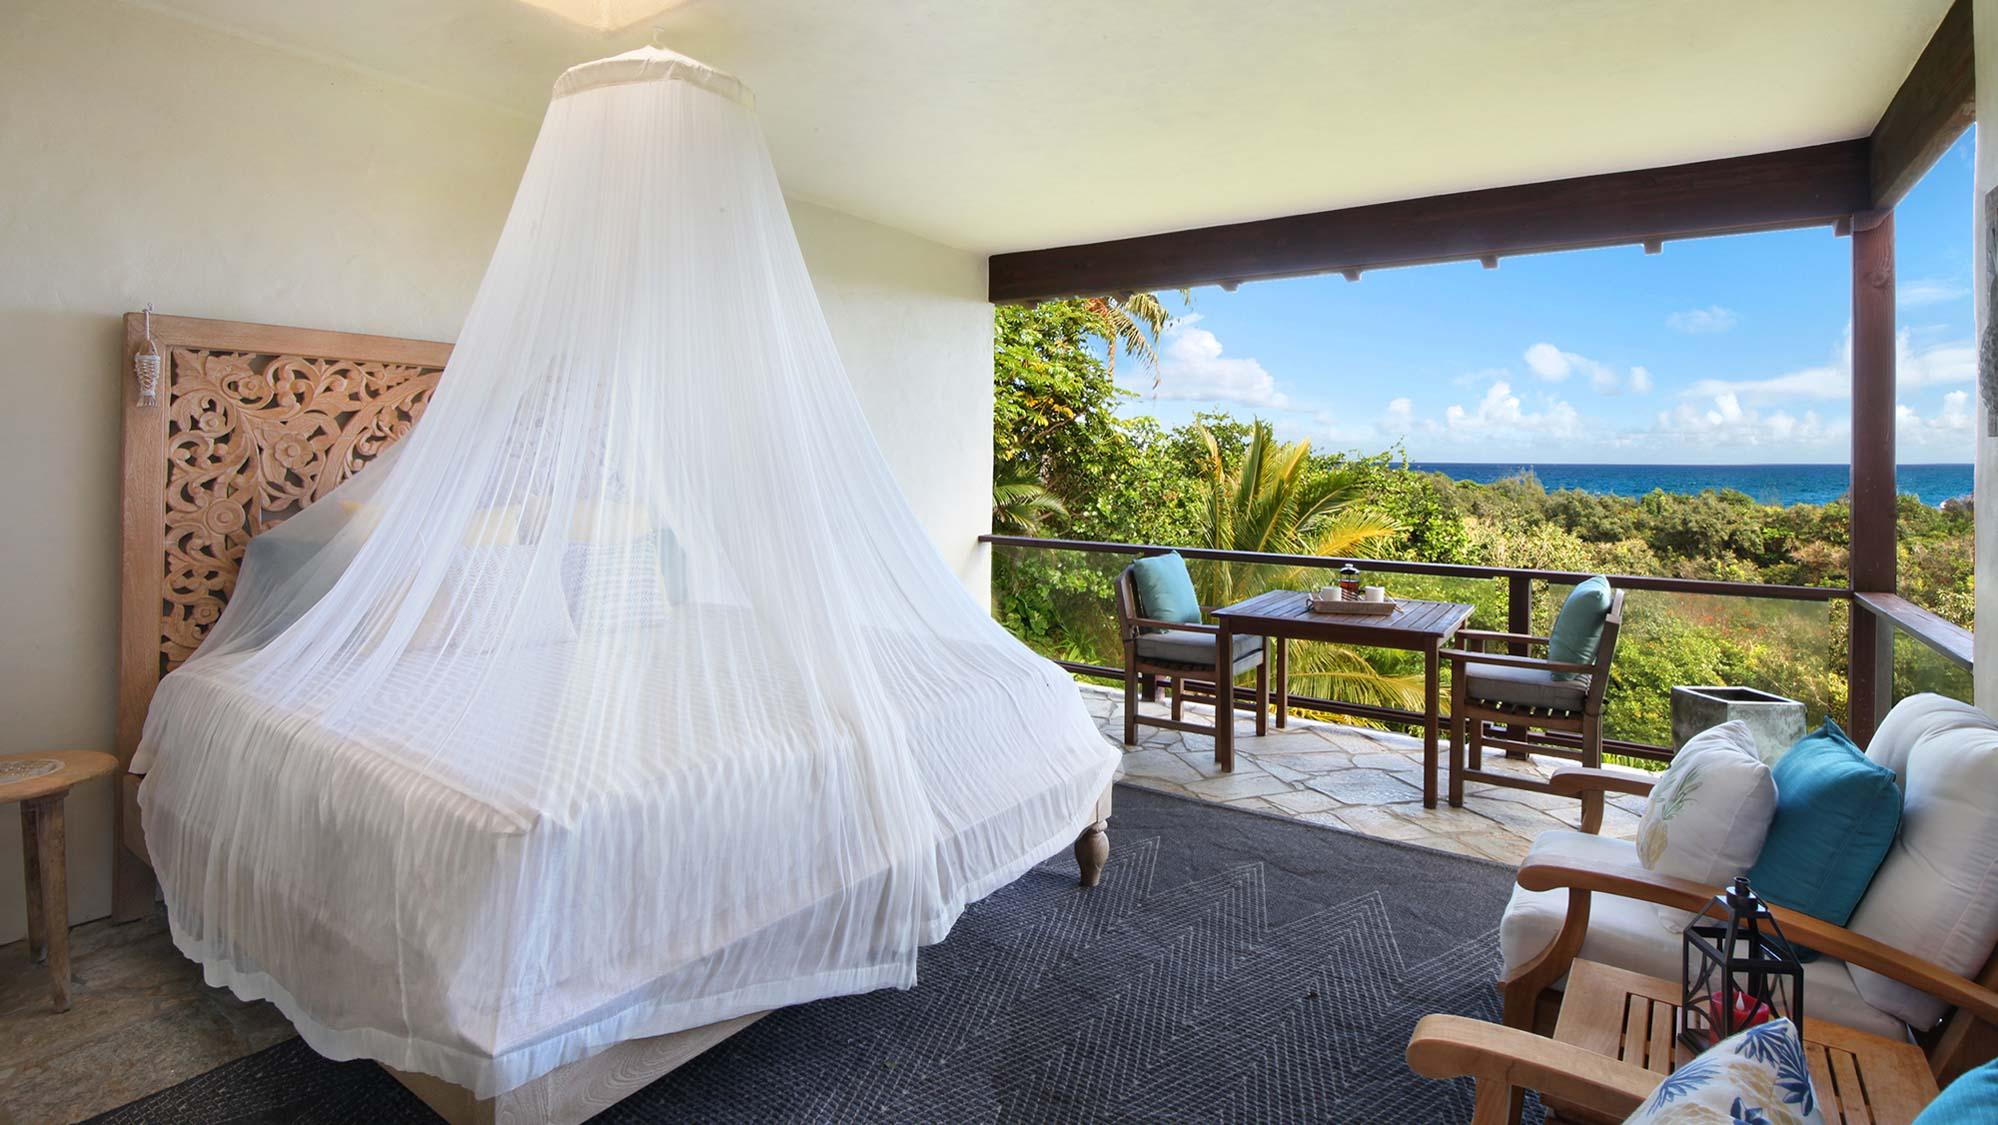 Kapiolani Villa at Princeville - Ocean View Covered Nap Nook - Parrish Kauai